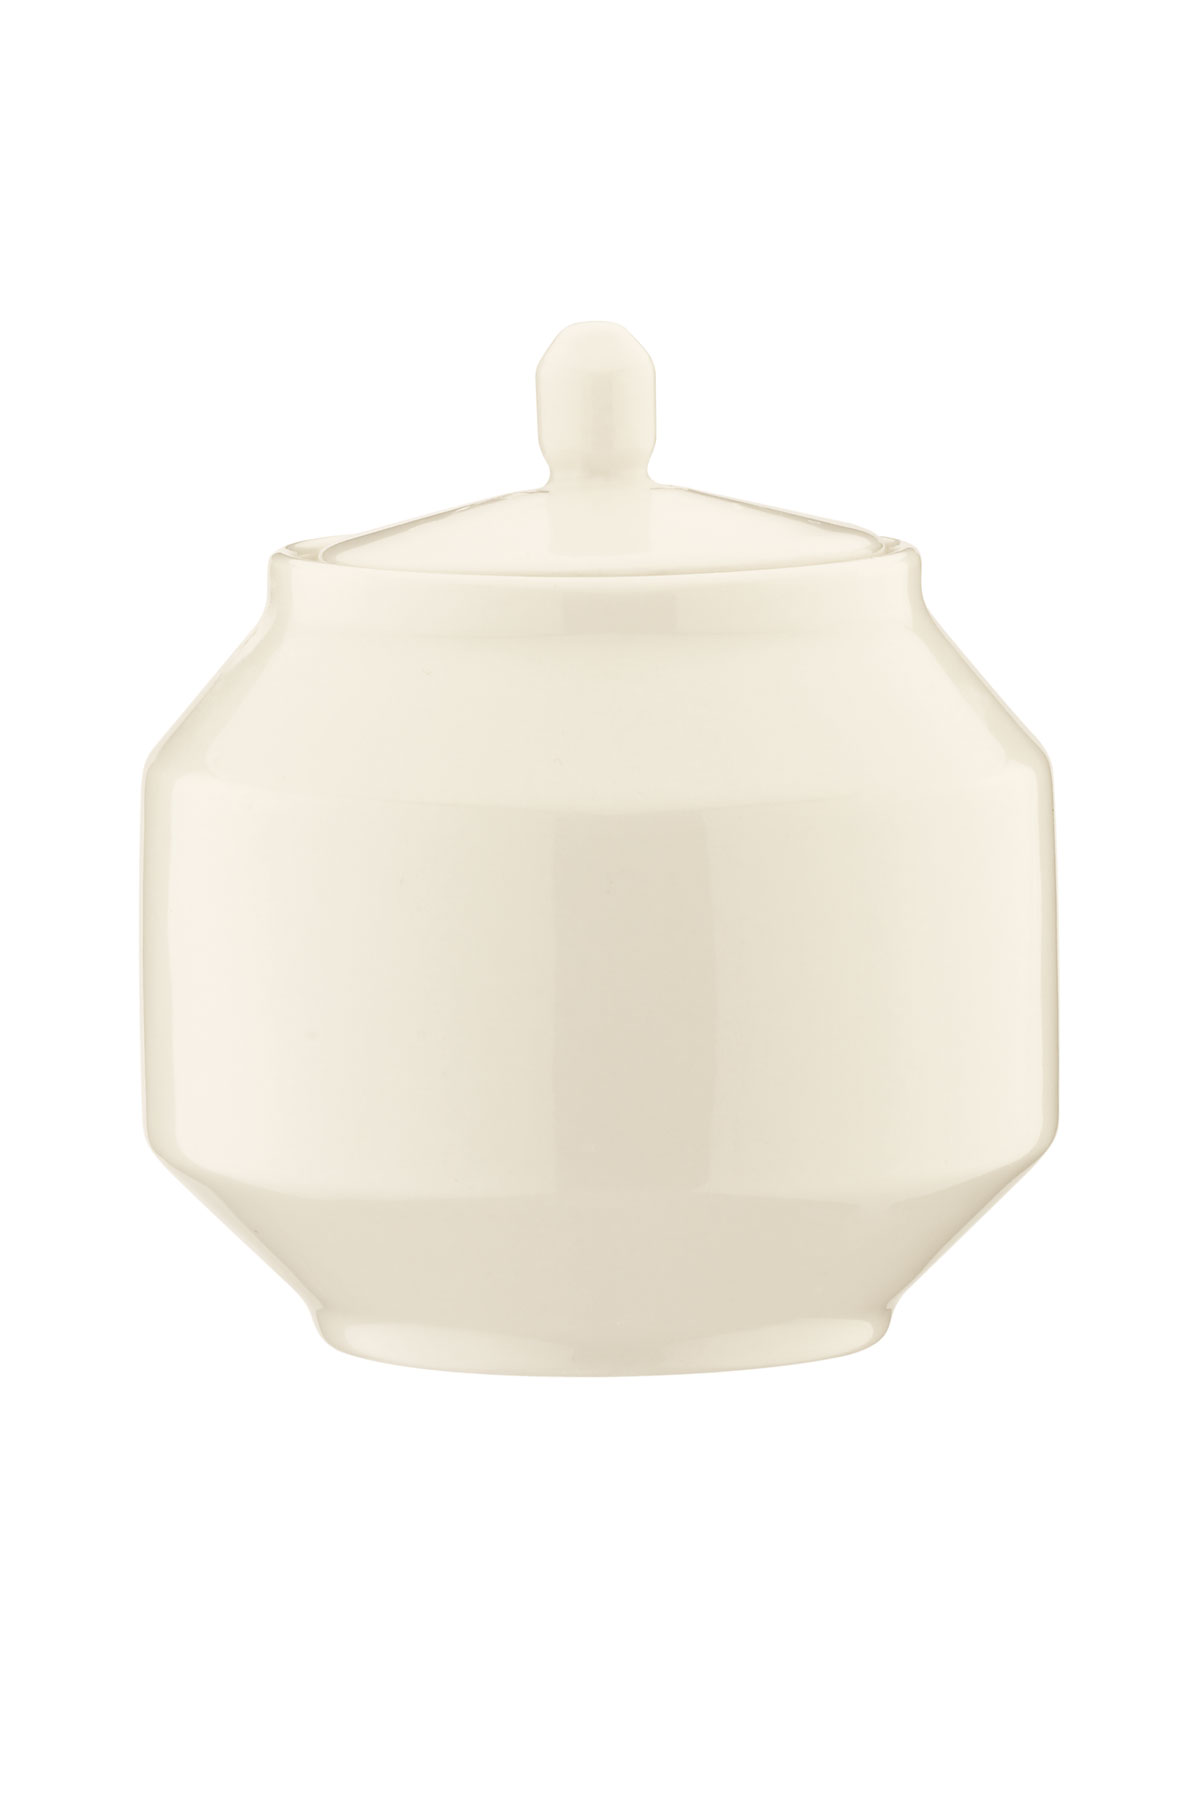 Kütahya Porselen - Kütahya Porselen Chef Taste Of Şekerlik Krem